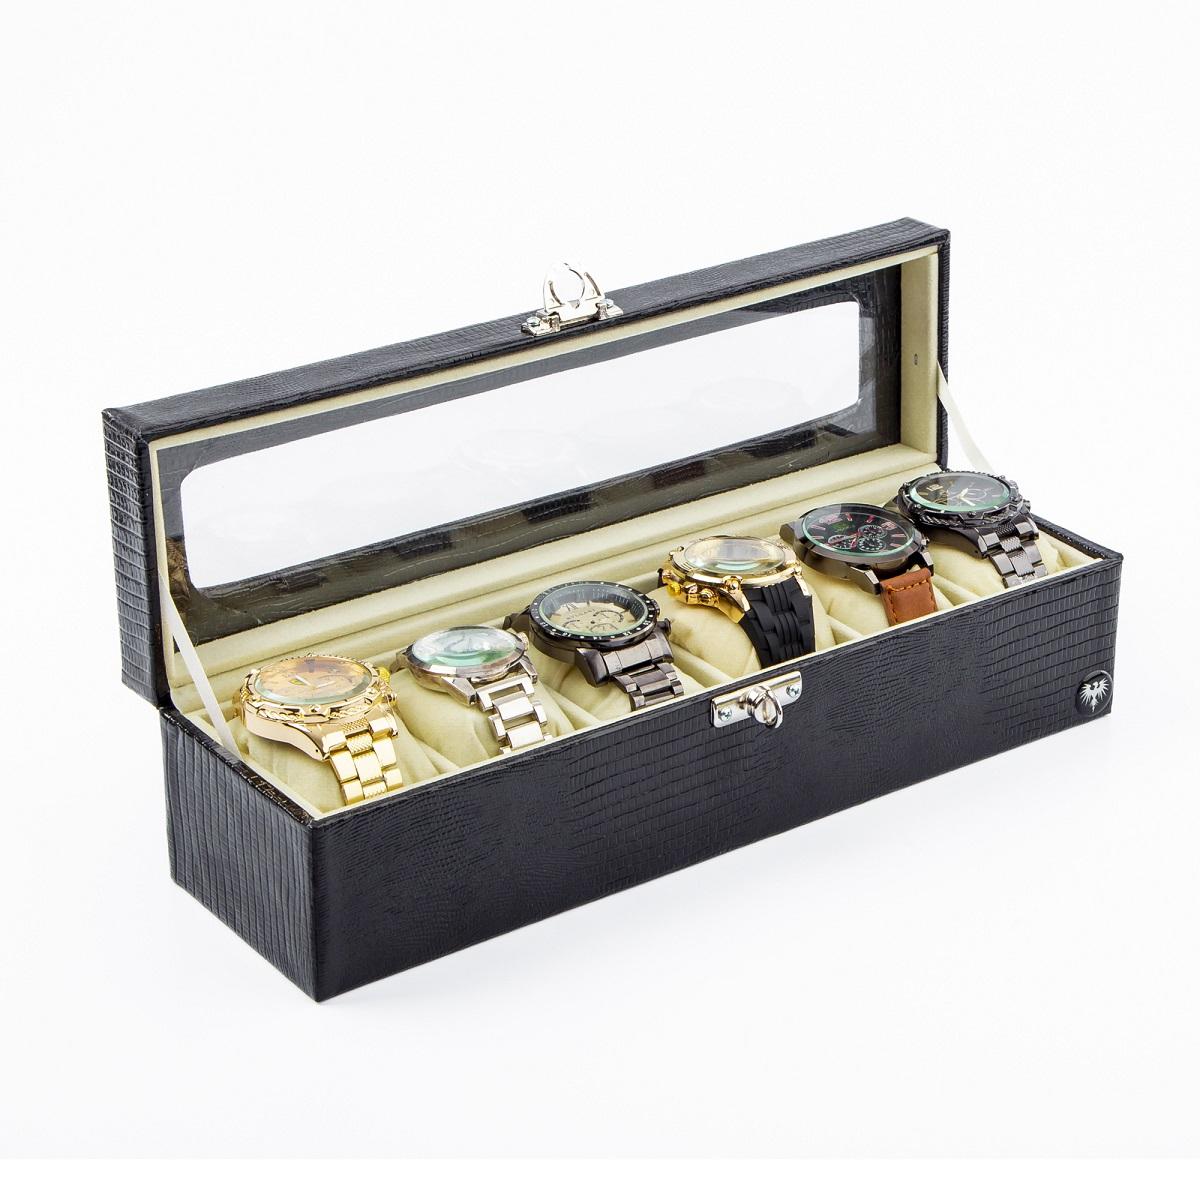 estojo-porta-relogio-6-nichos-couro-ecologico-preto-bege-imagem-1.jpg